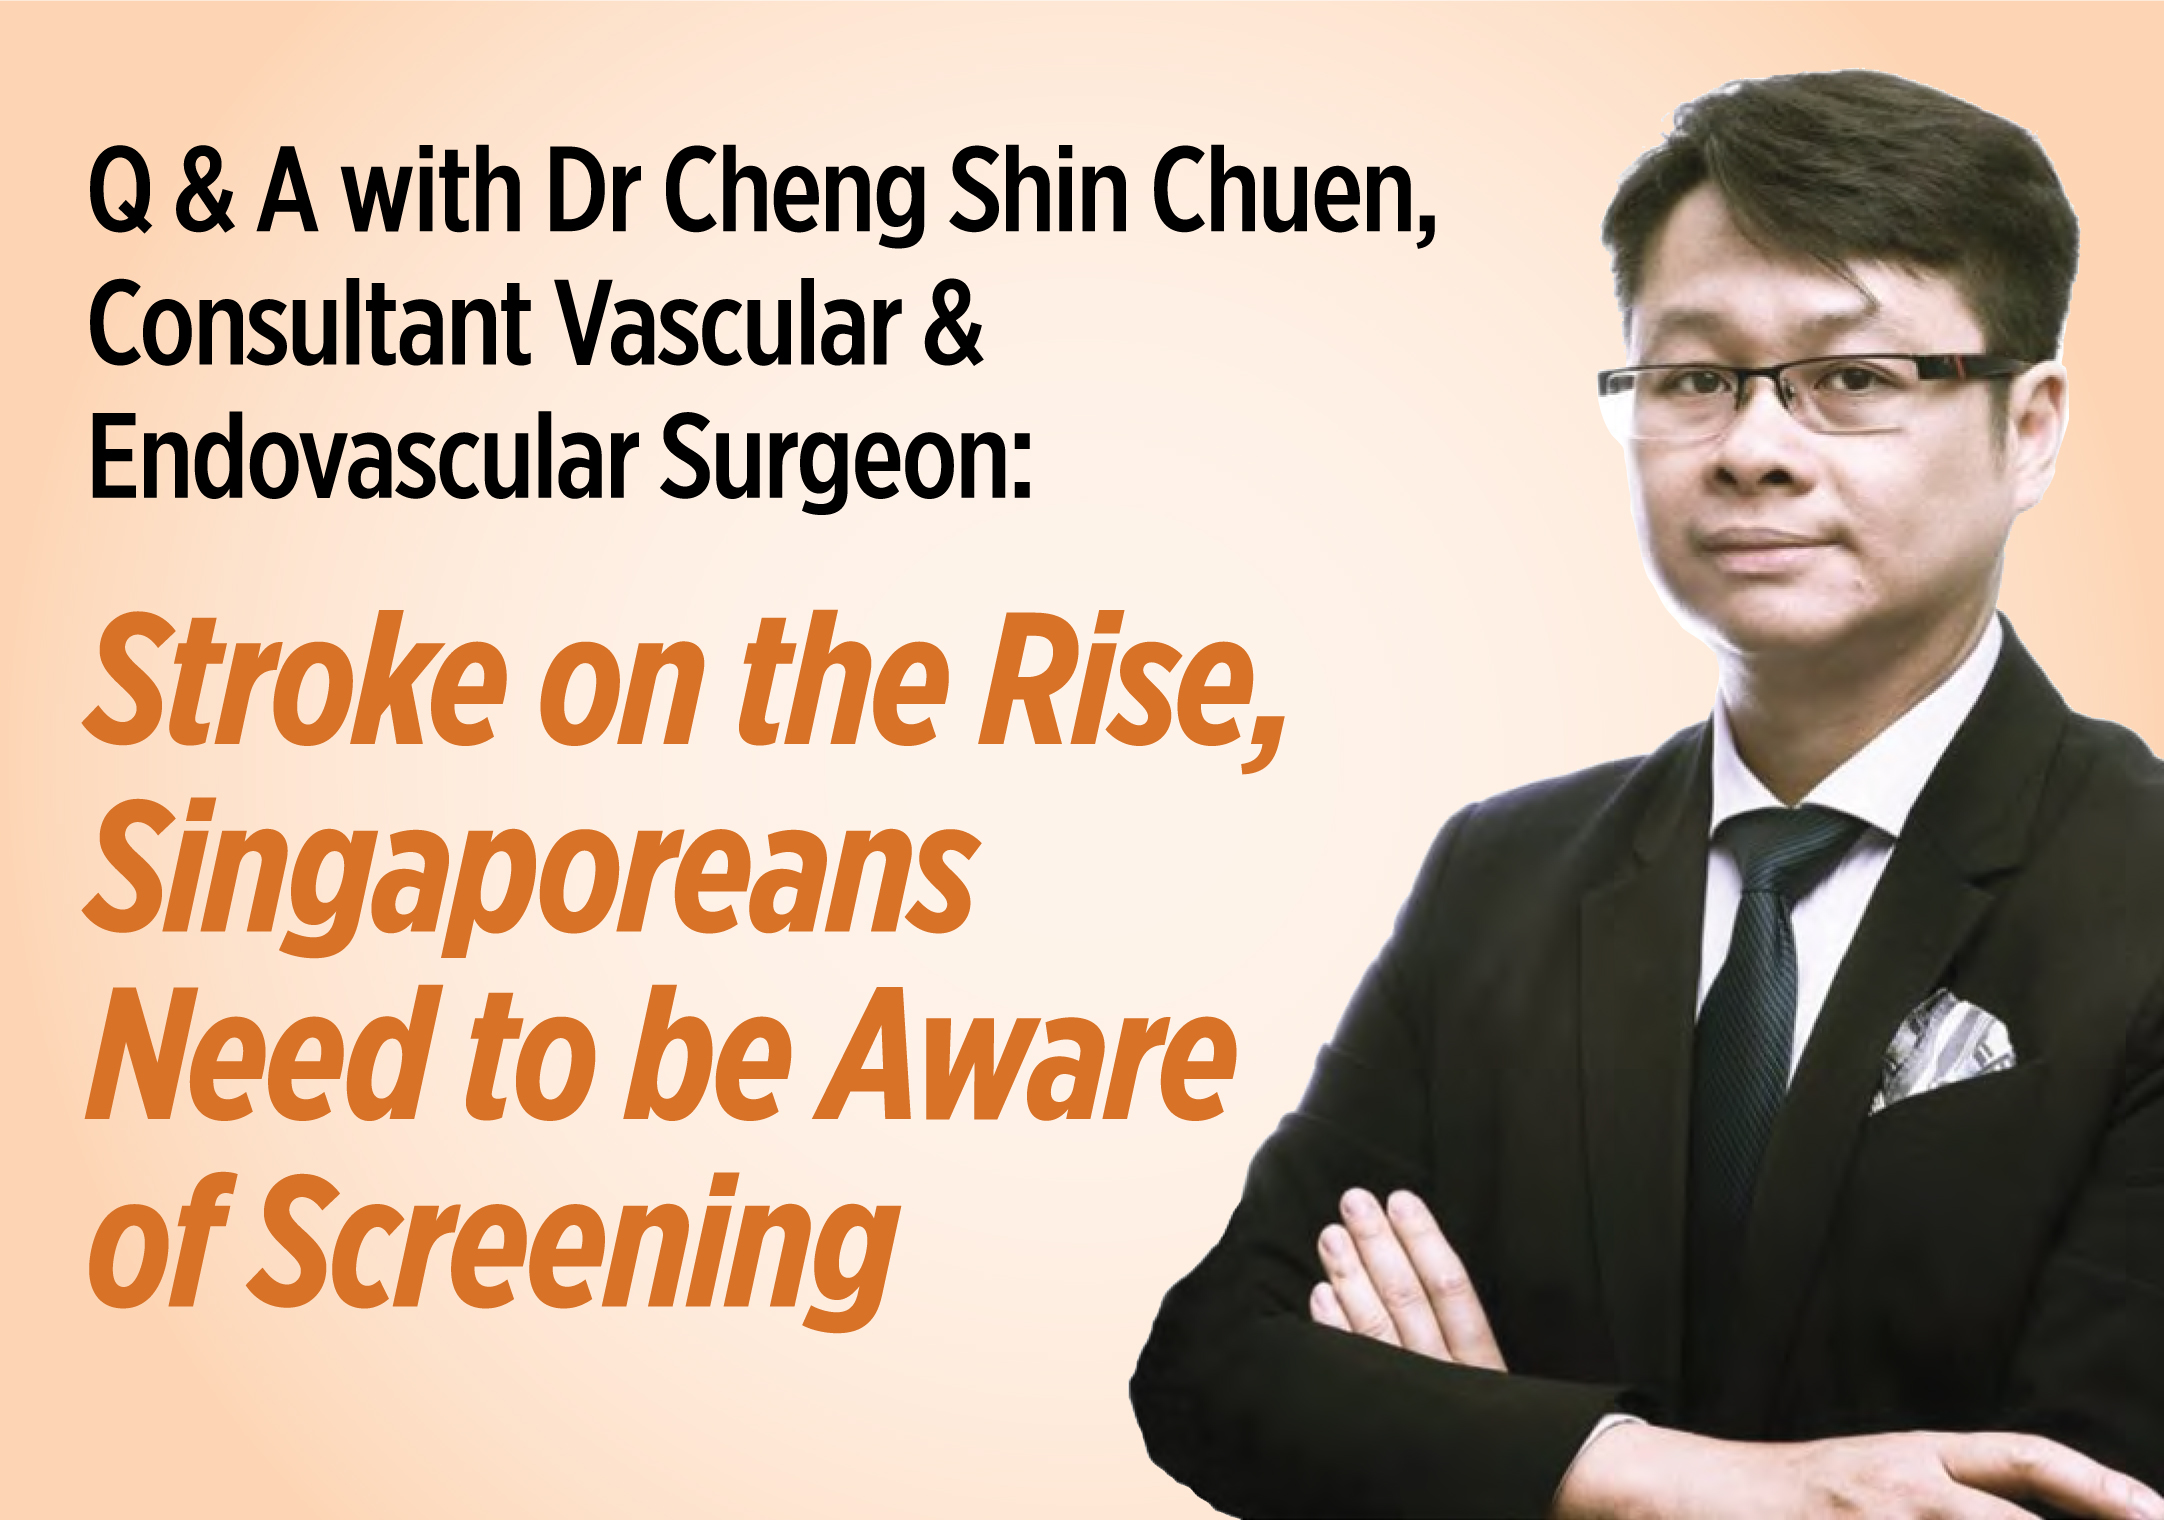 Q & A with Dr Cheng Shin Chuen, Consultant Vascular & Endovascular Surgeon